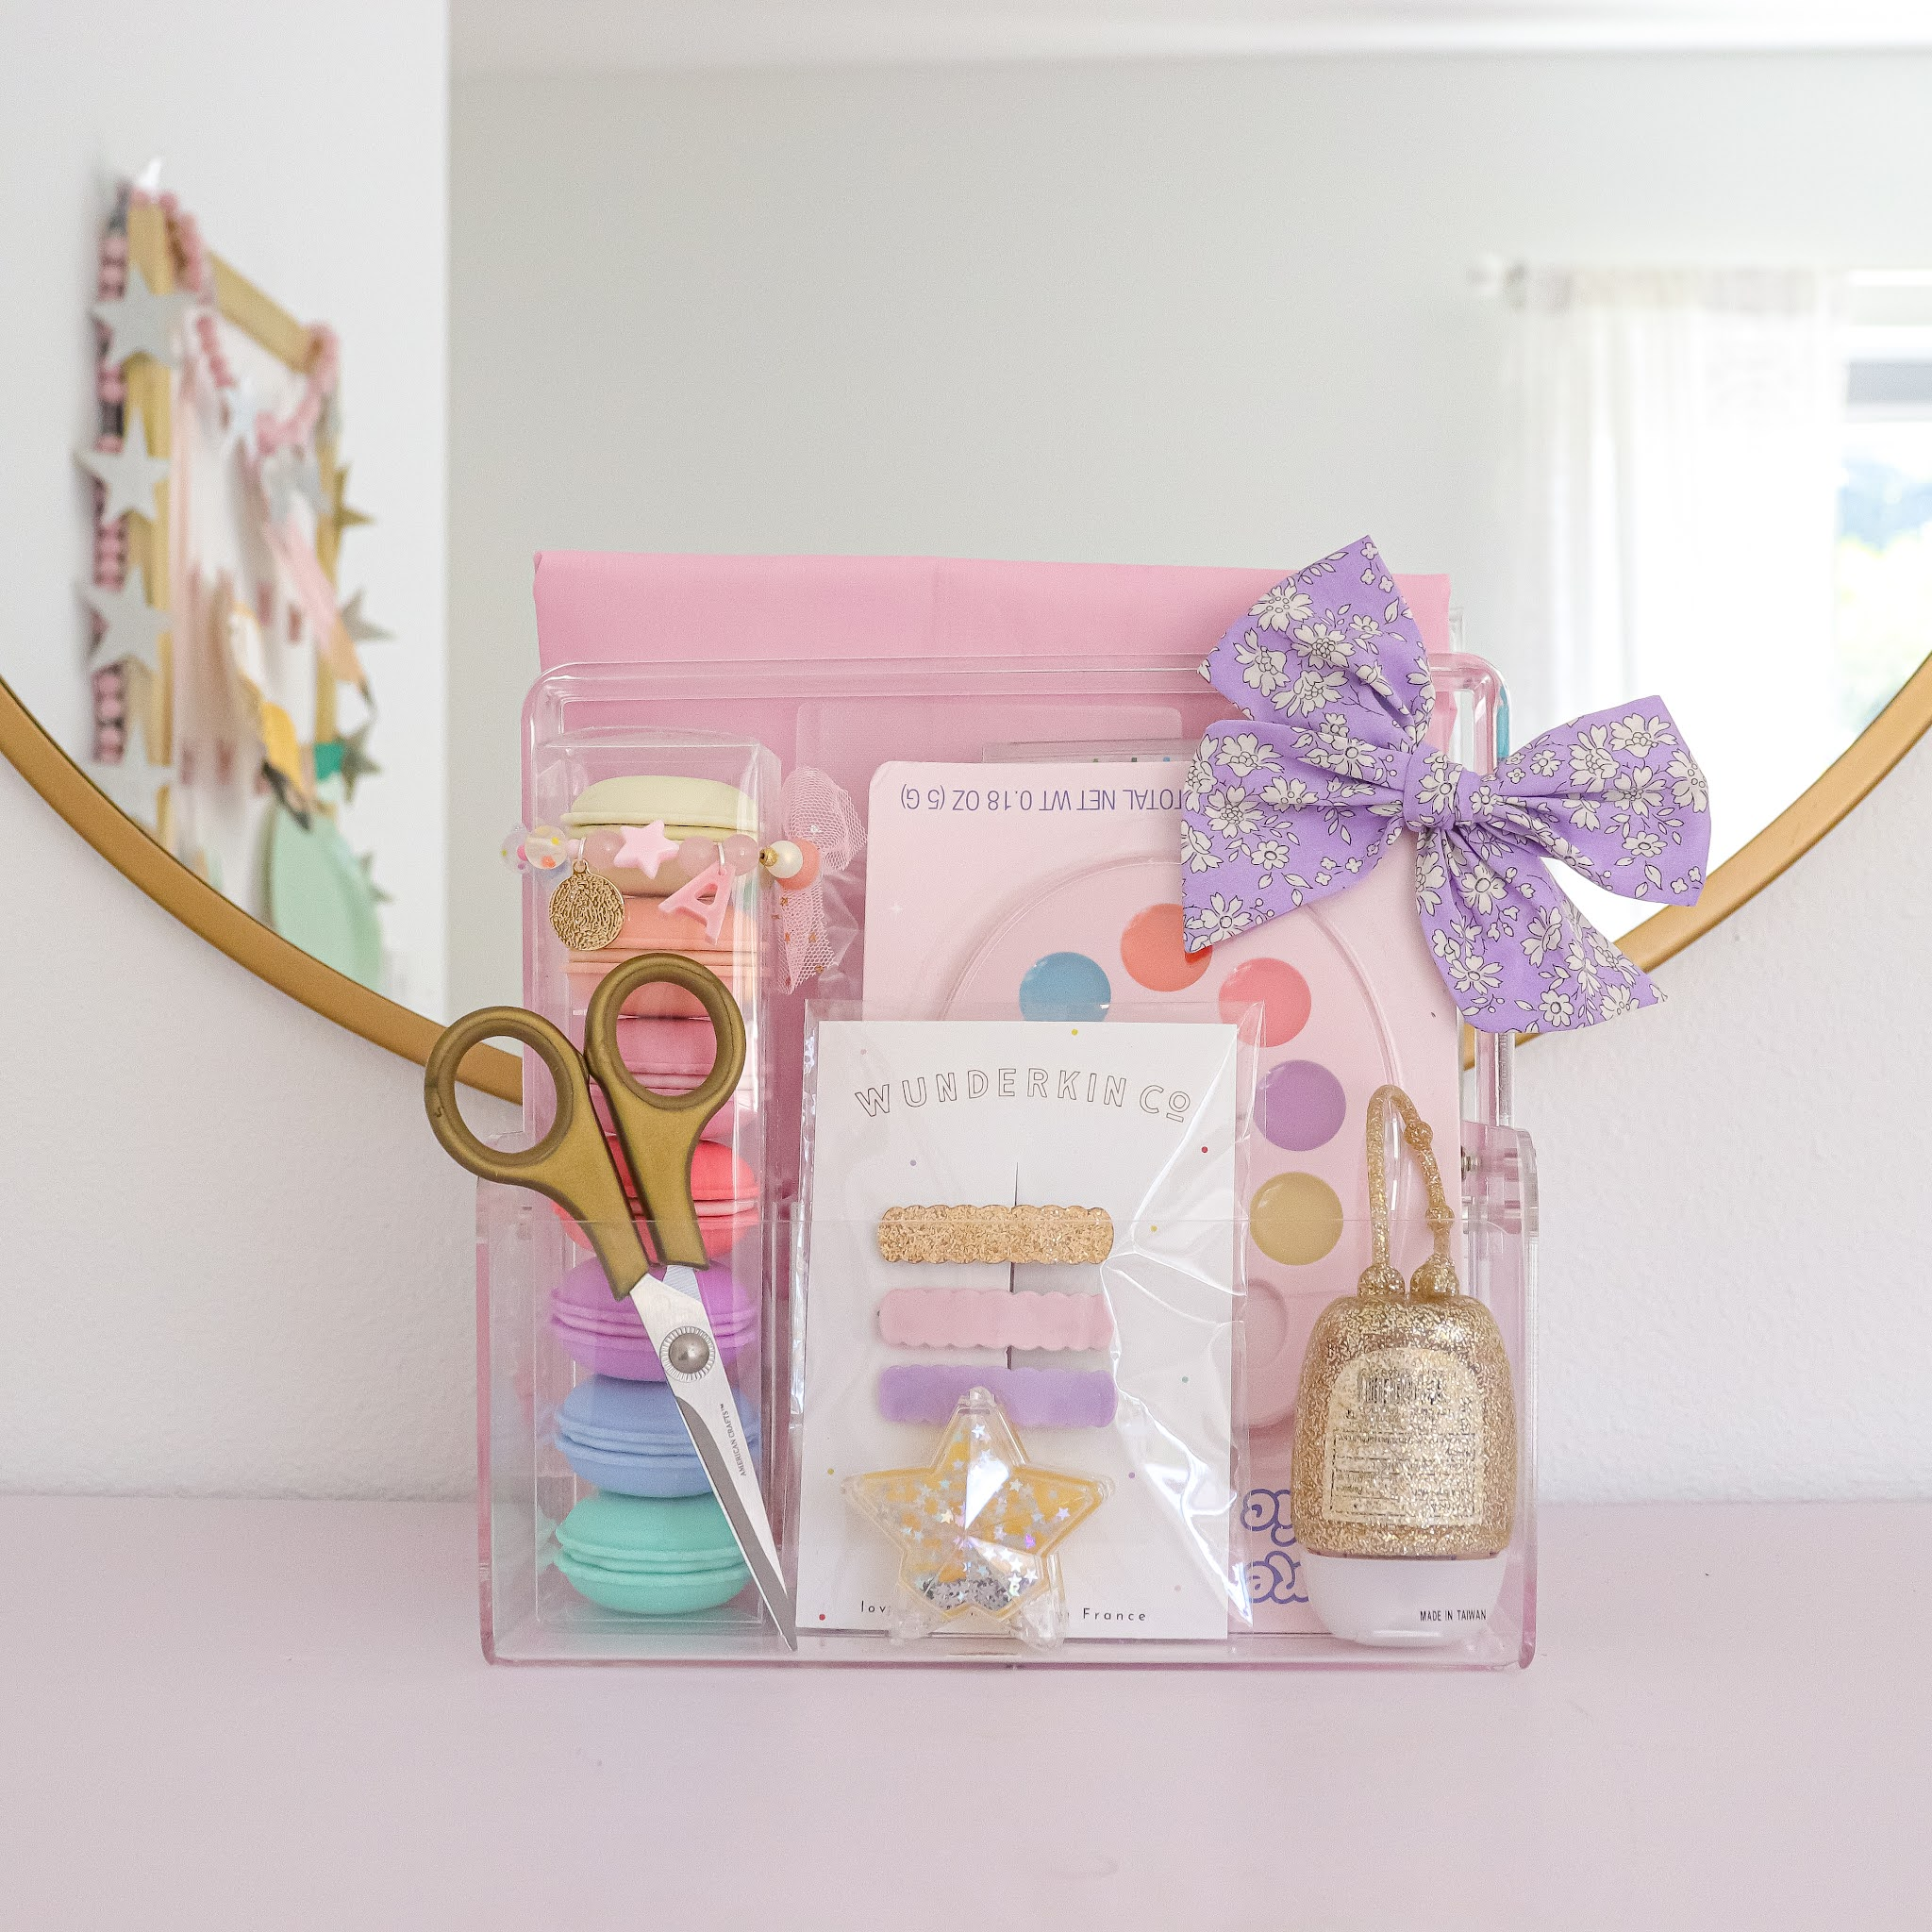 mini maker craft supplies